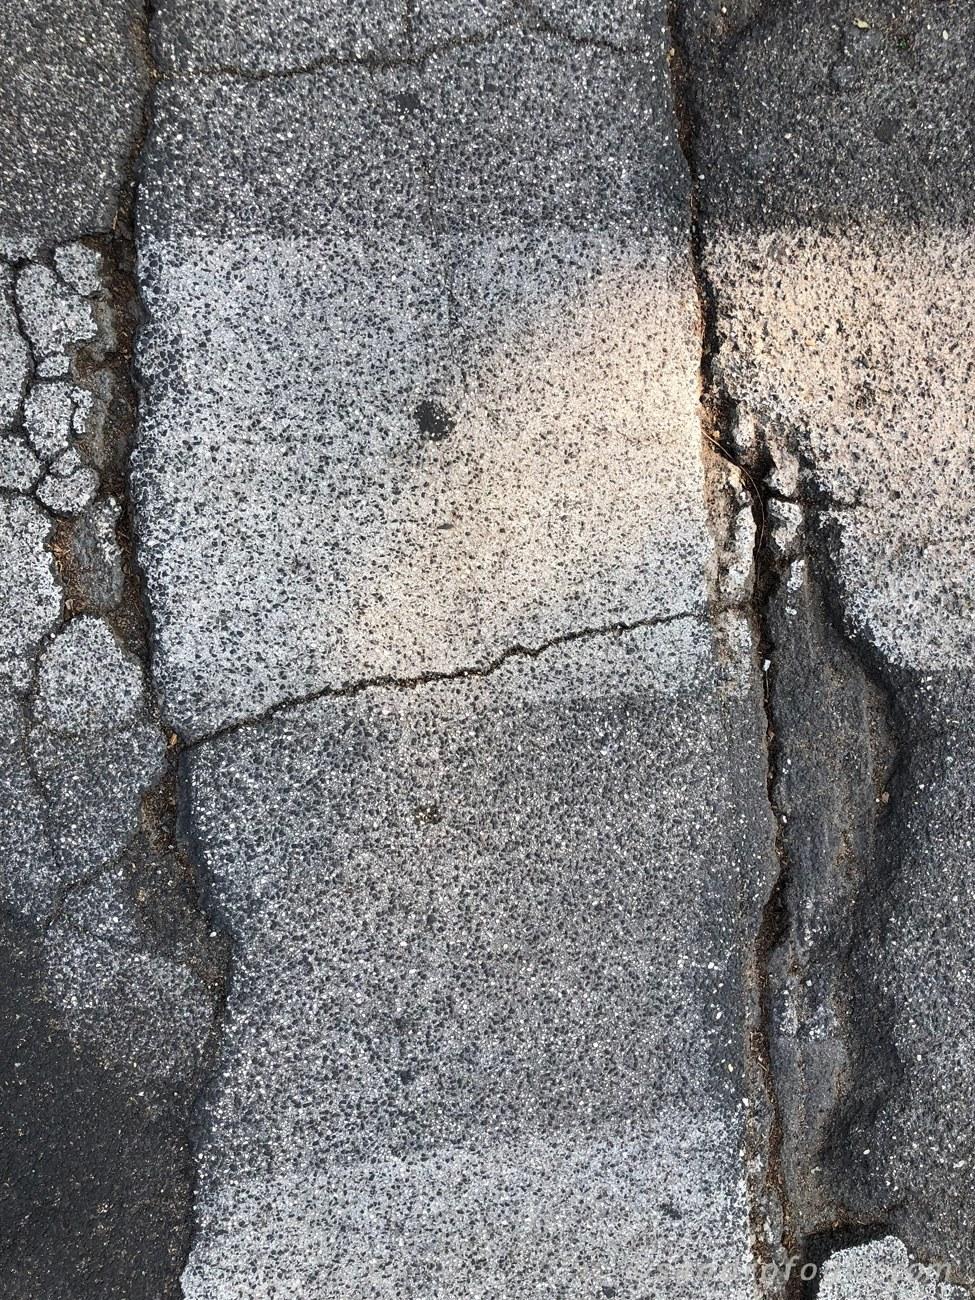 2018 City traces - 31